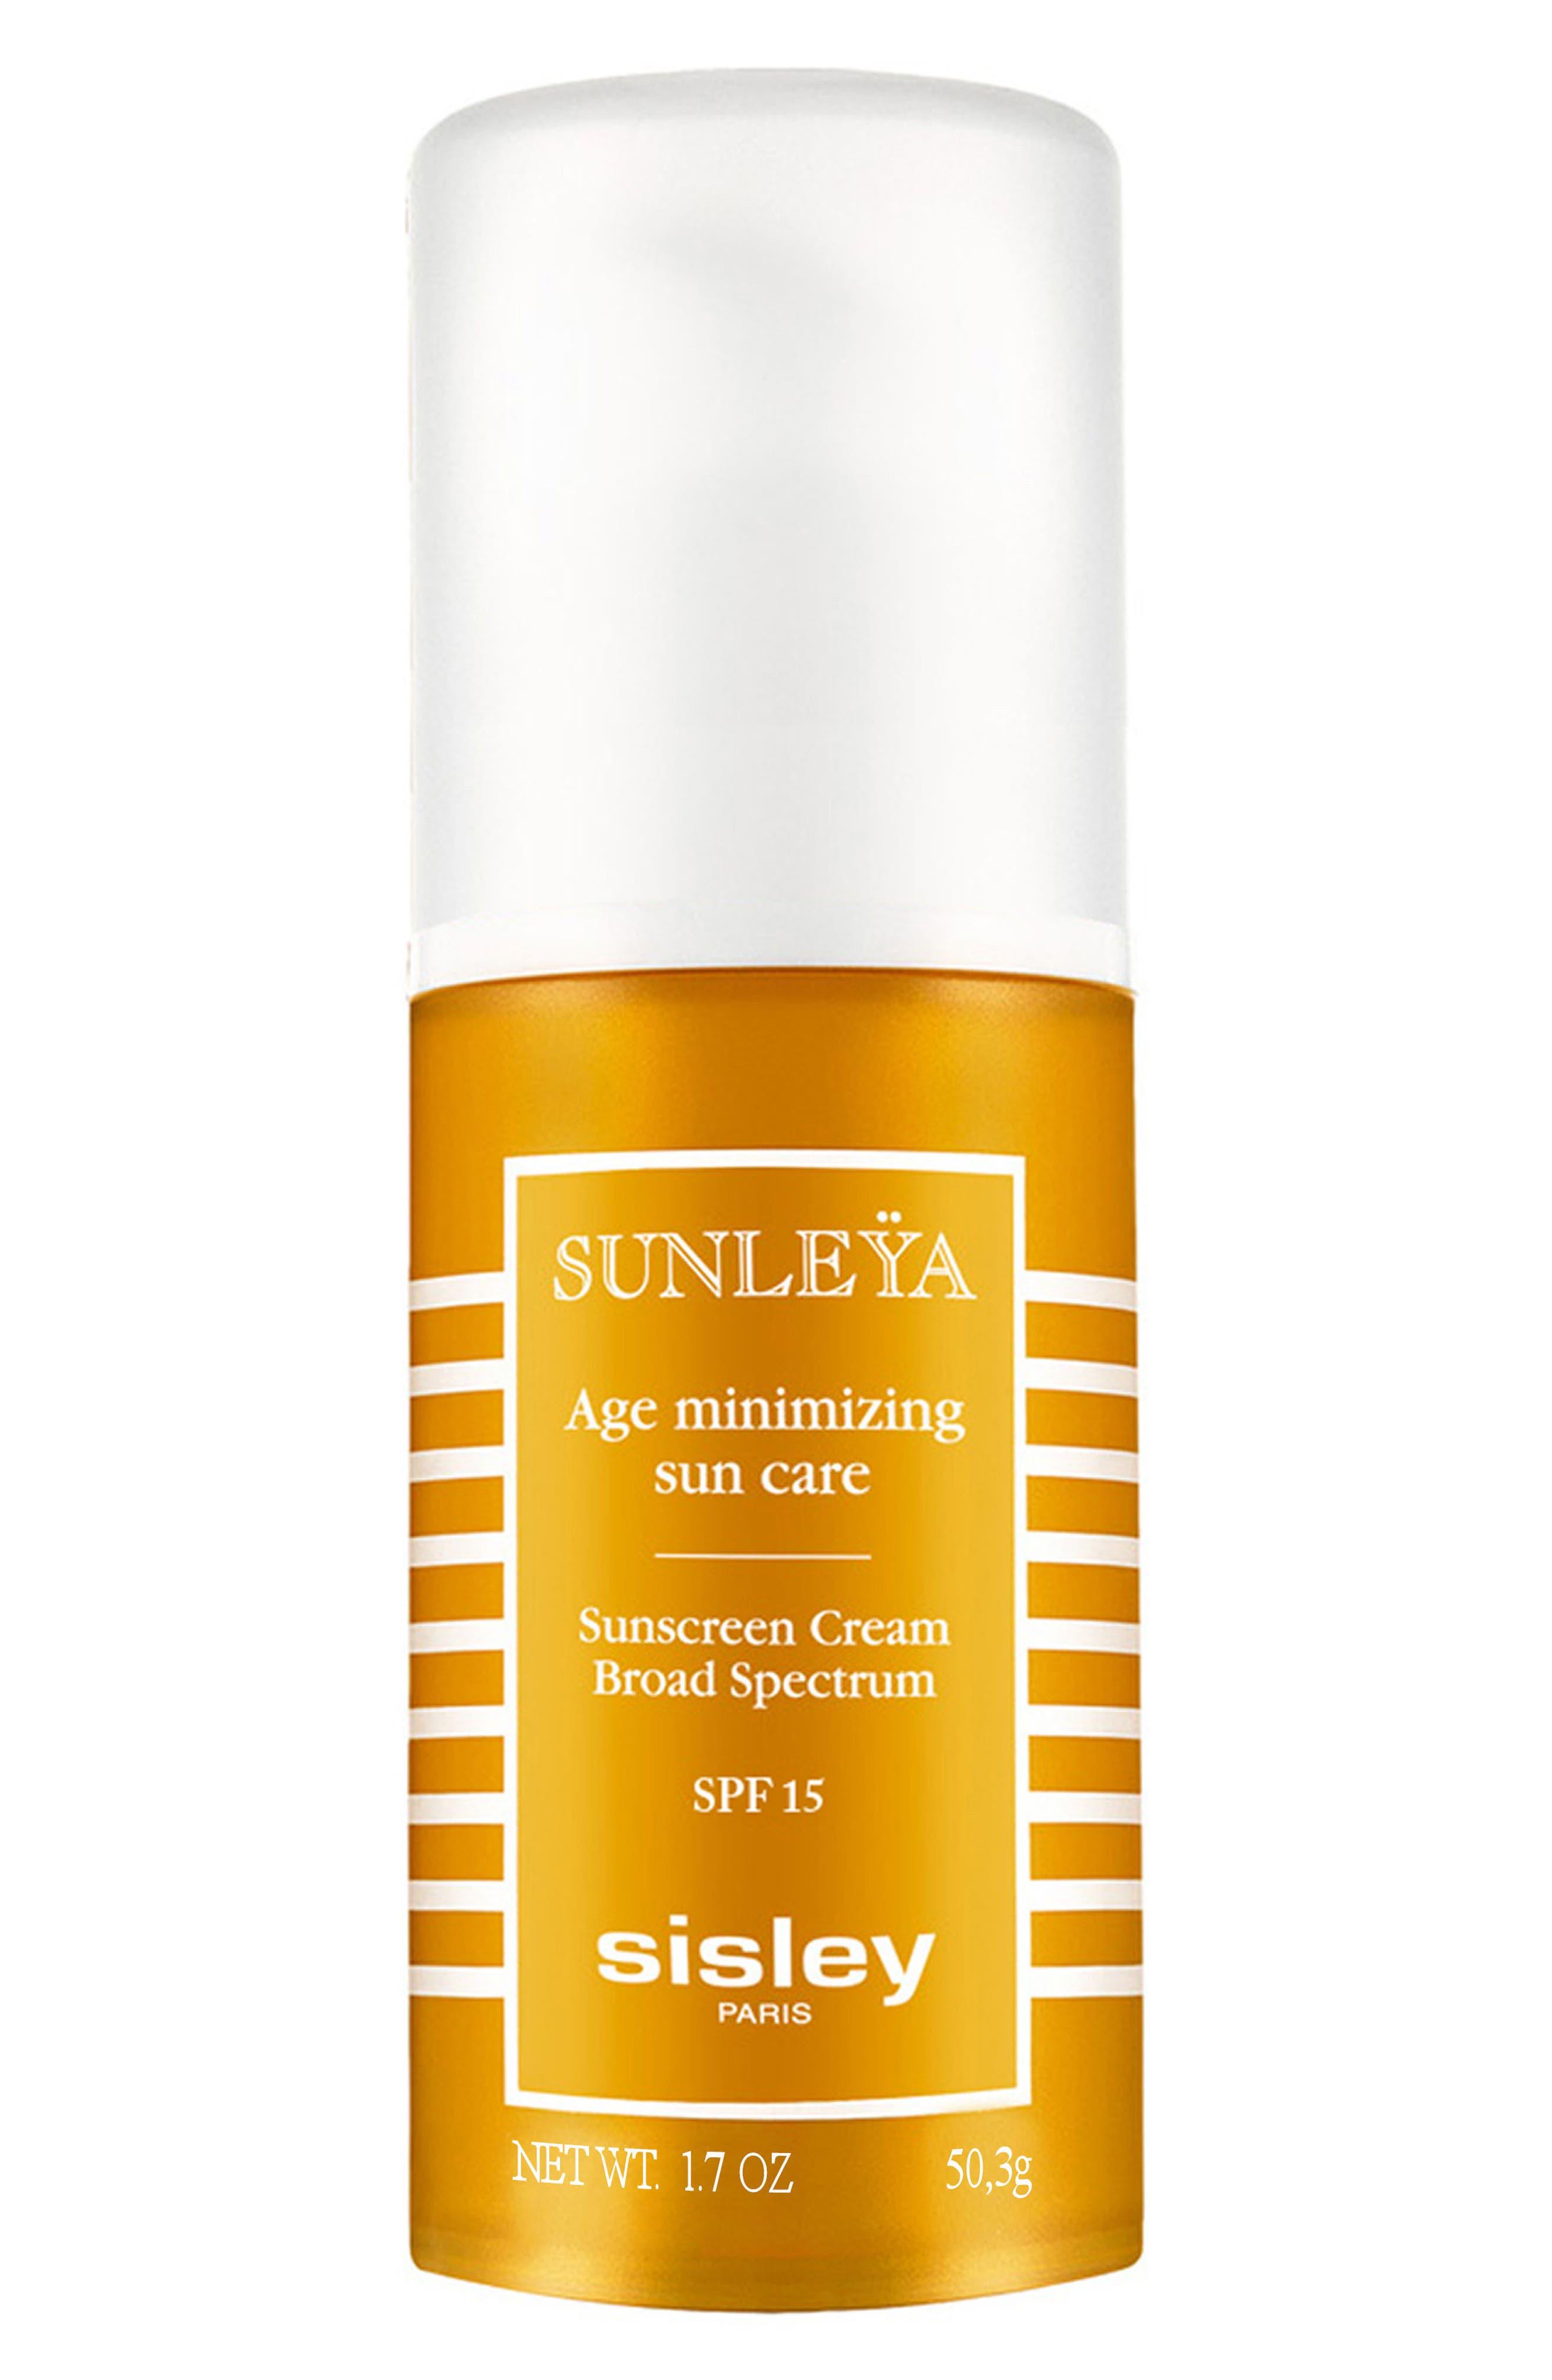 Alternate Image 1 Selected - Sisley Paris 'Sunleÿa' Age Minimizing Sun Care SPF 15